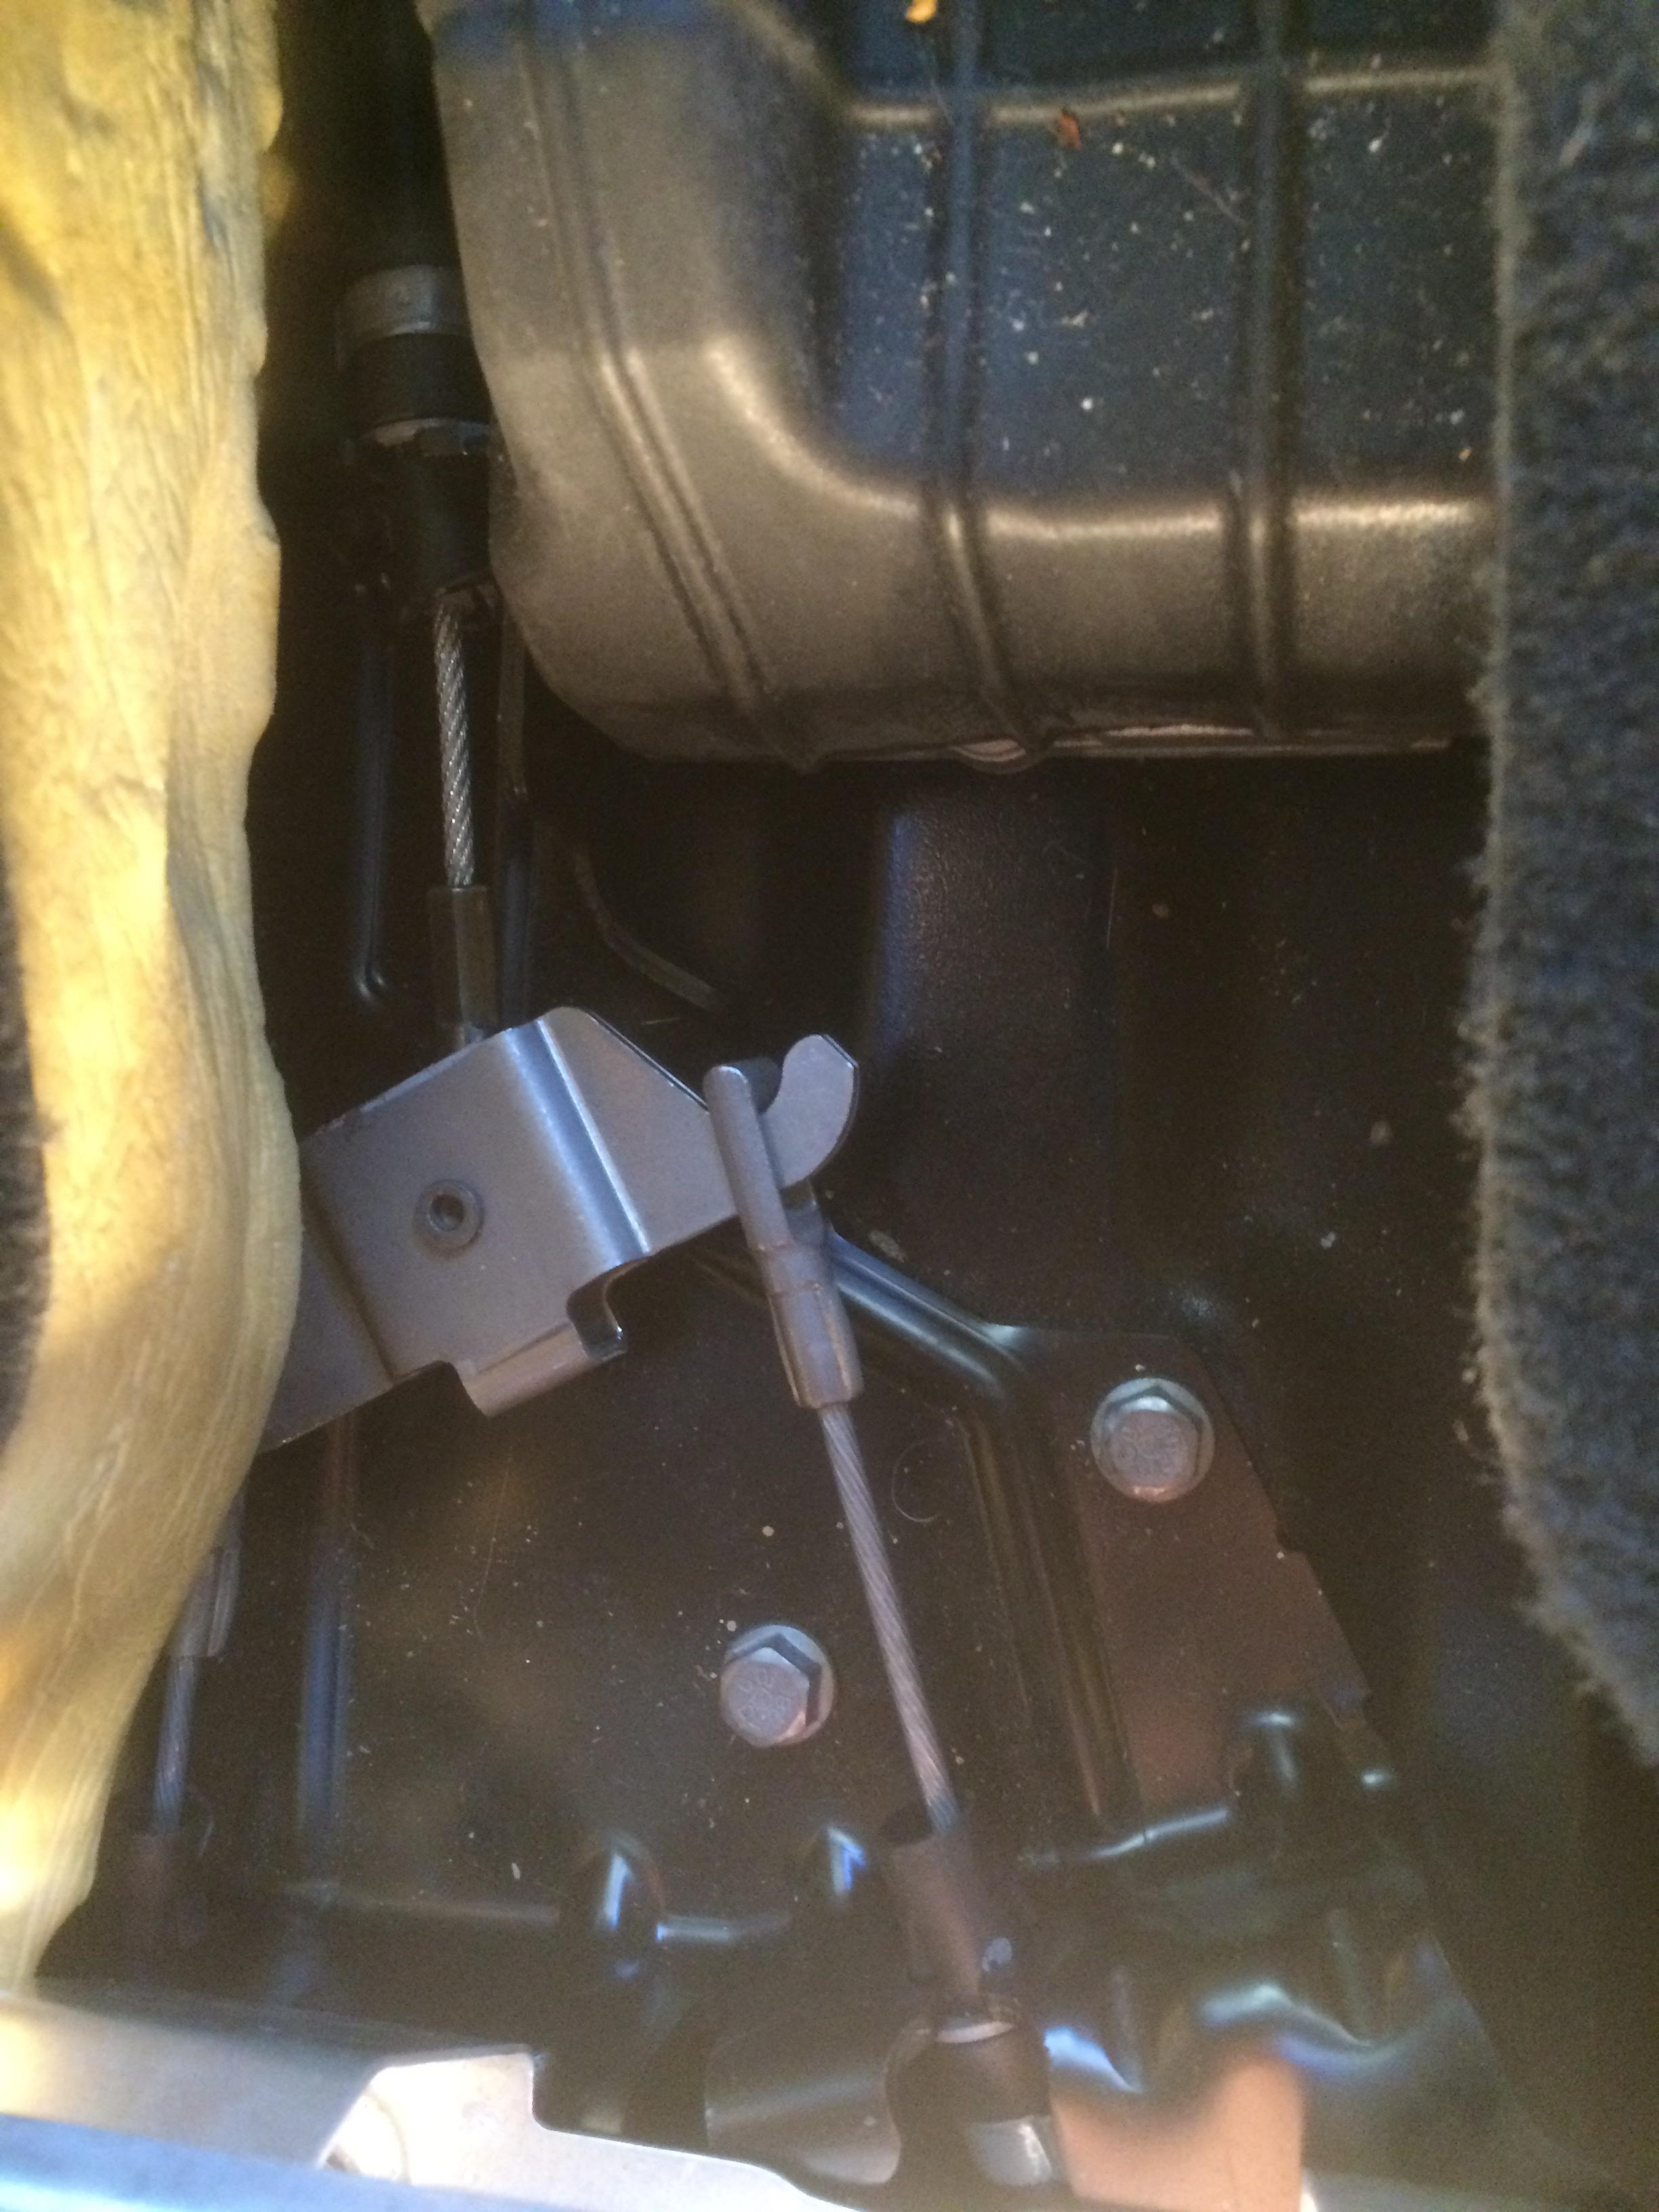 2008 XC90 Parking brake problems